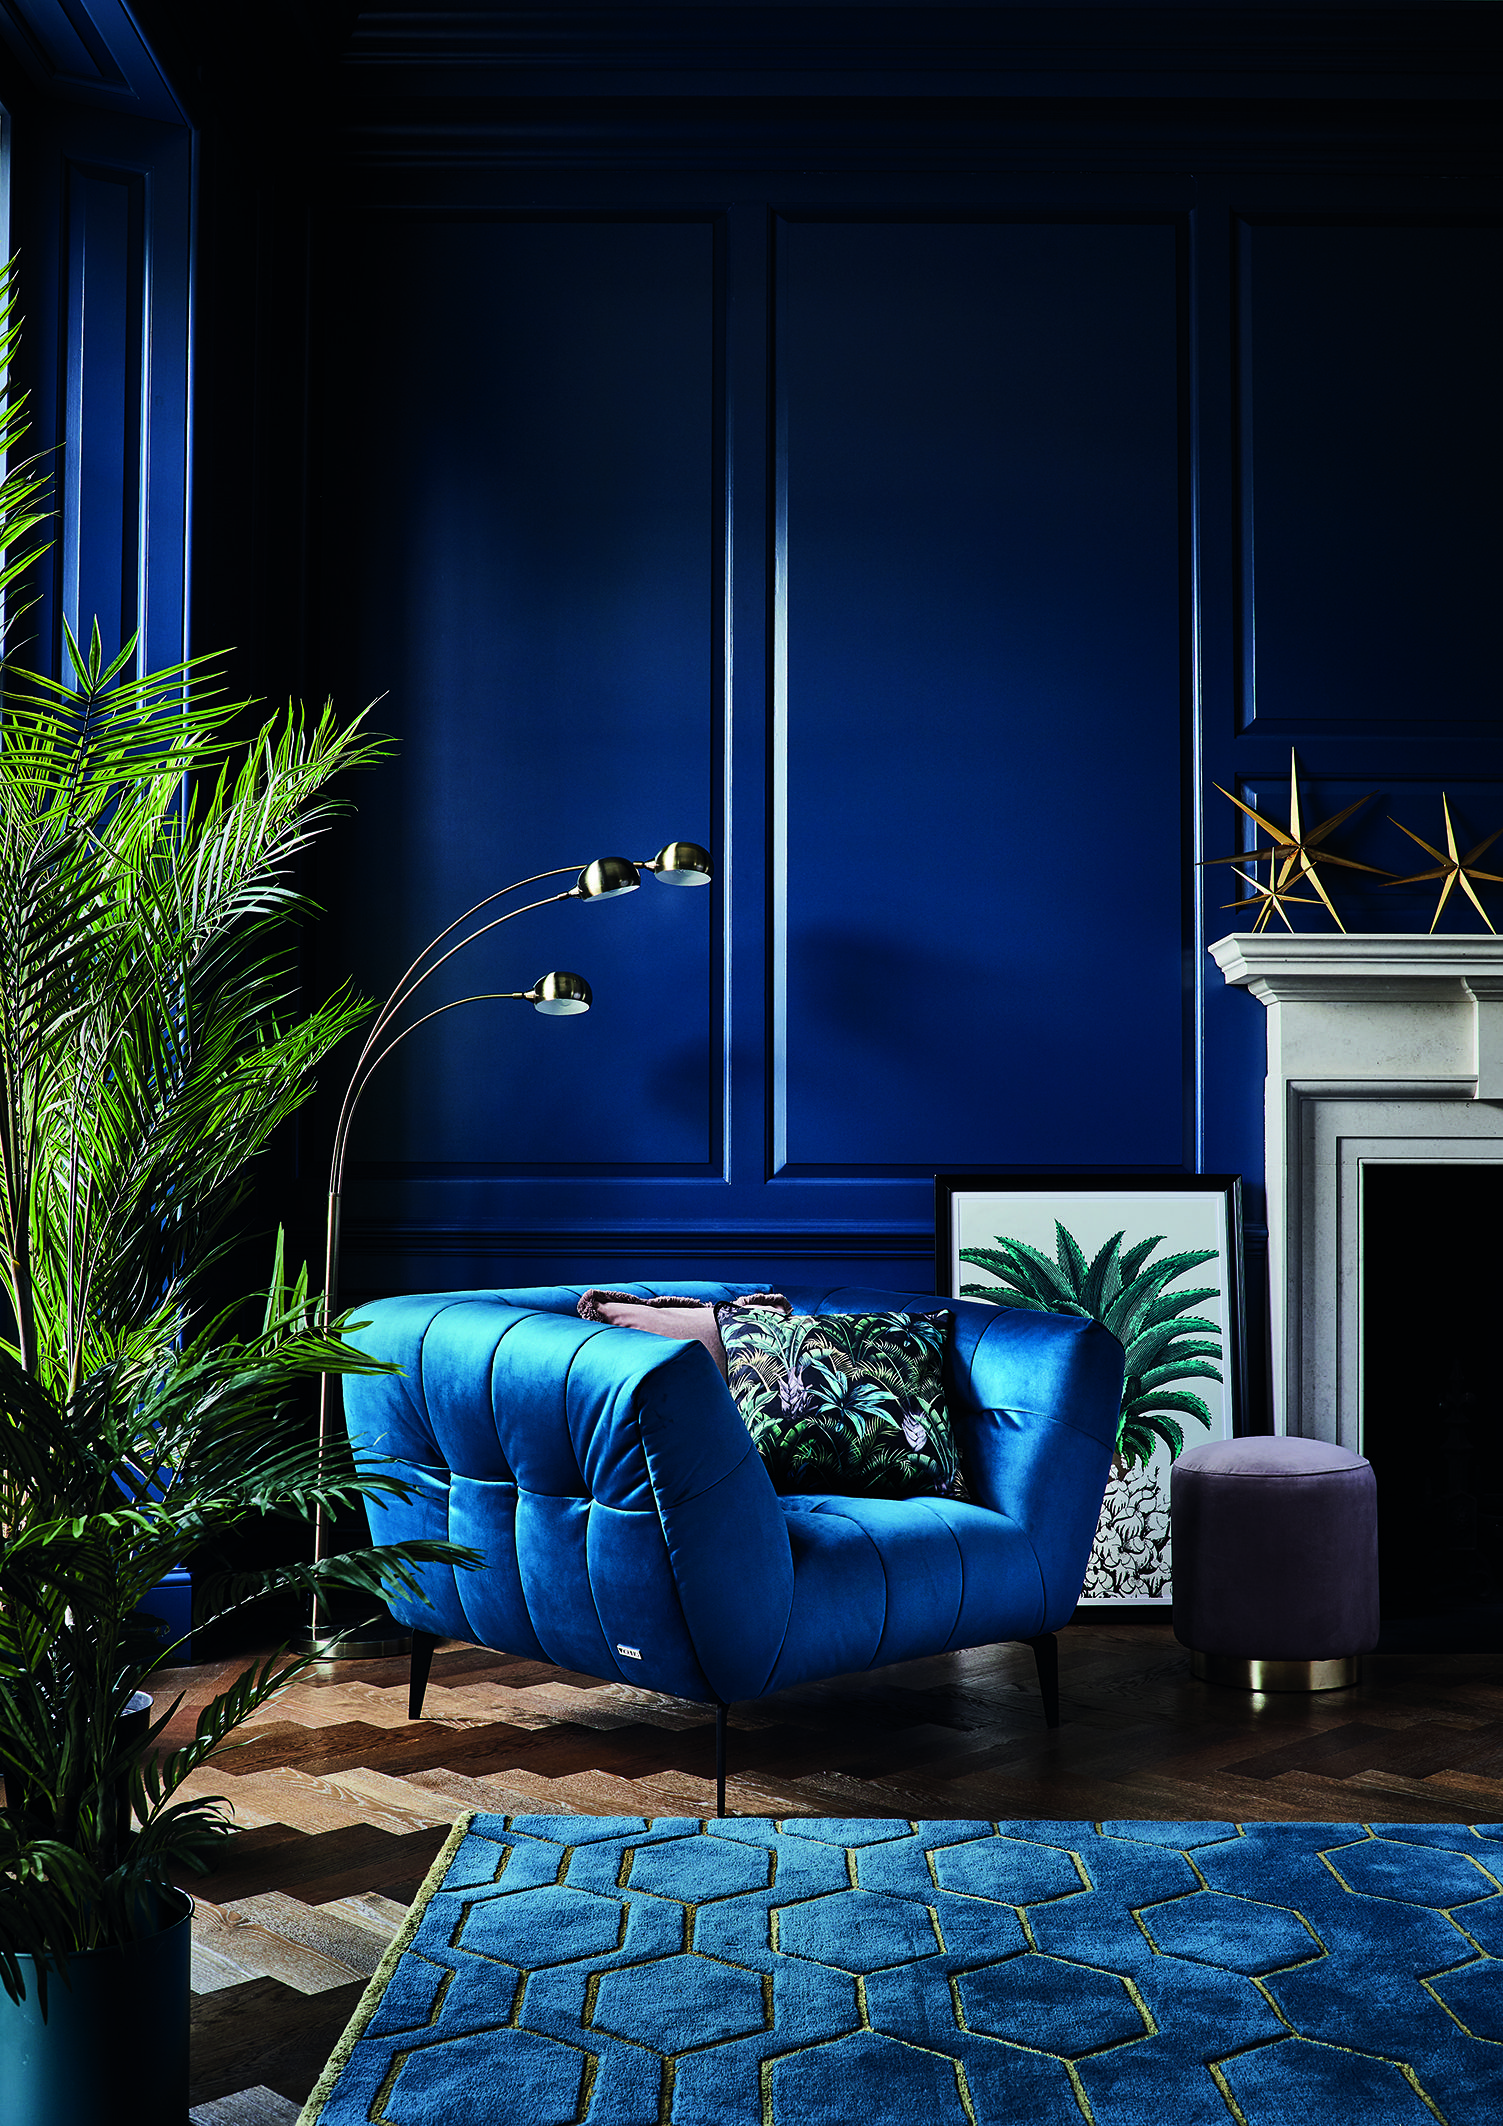 Update your interior for autumn 2018 with our luxurious Midnight Tropics trend. Bold blue velvets meet sleek gold metallics for an opulent vibe. #artdecointerior